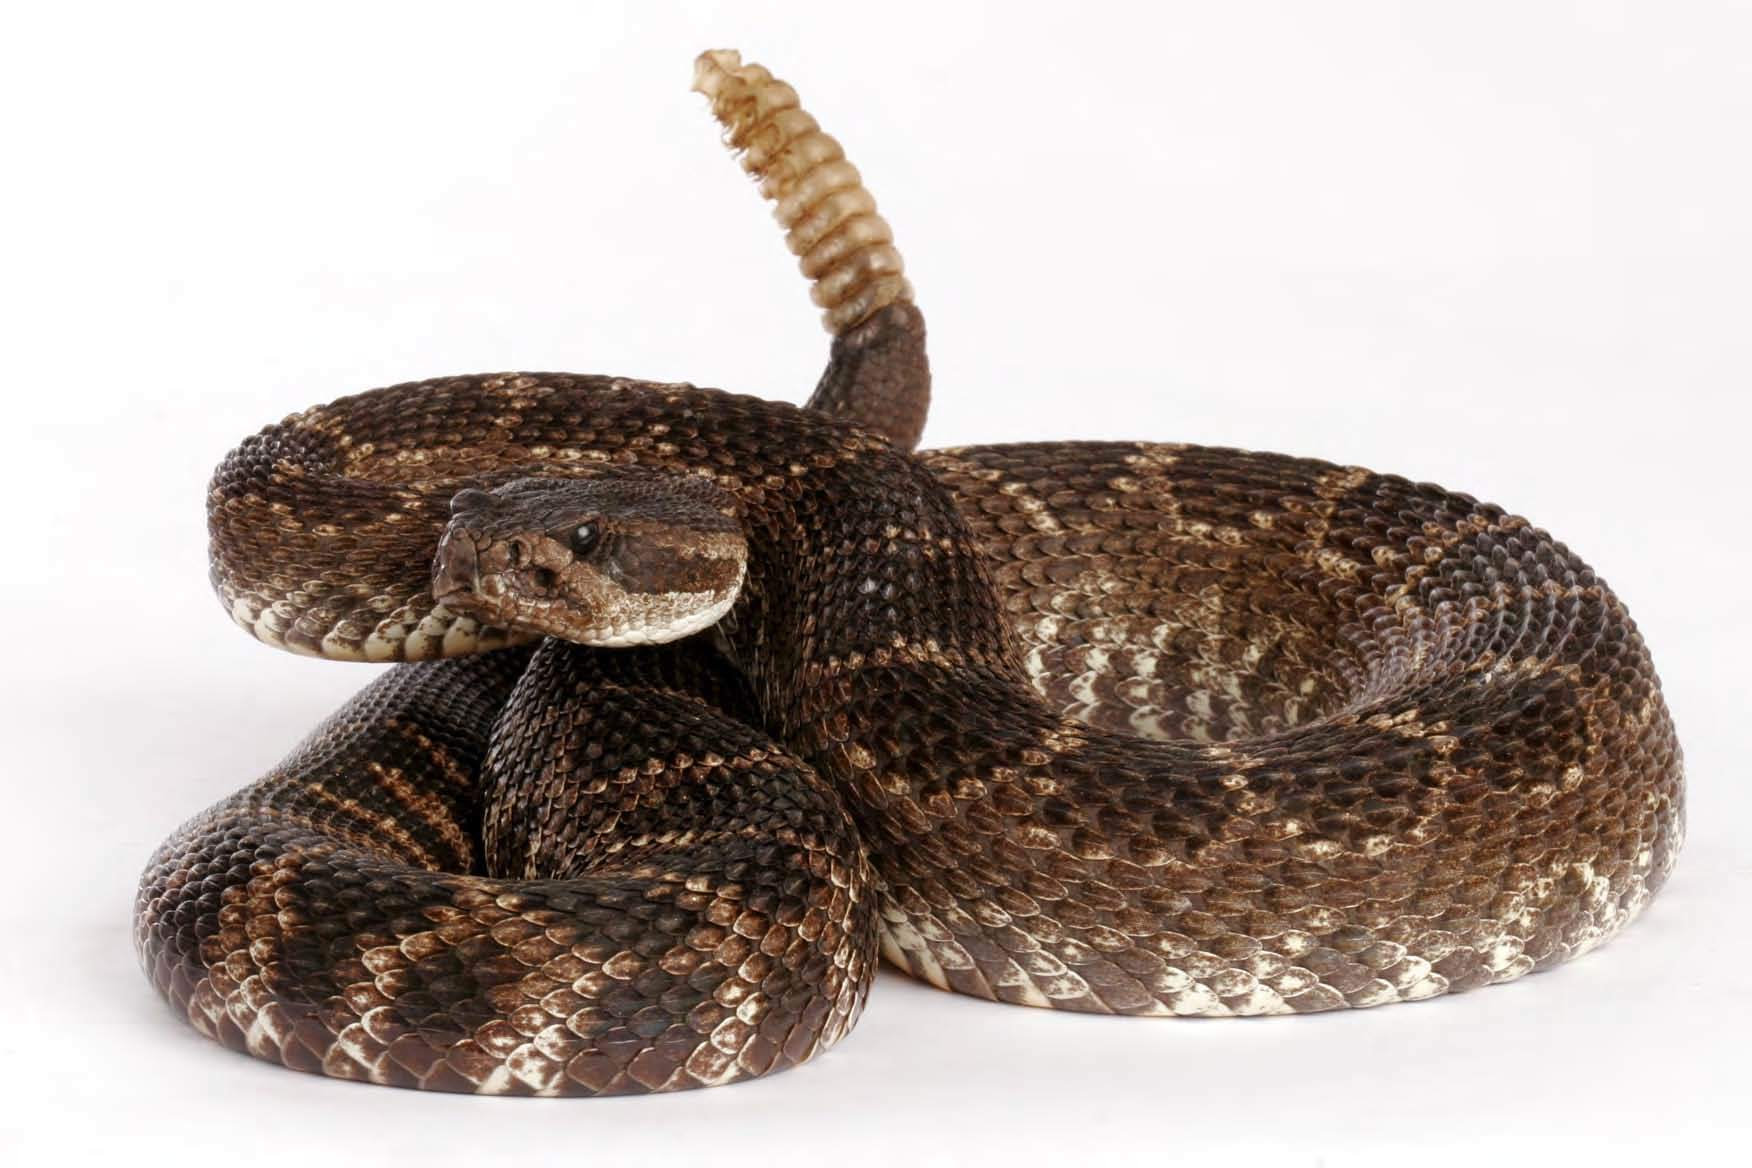 Rattlesnake Hd Wallpapers   Snake Rattle Wallpaper 1752x1168